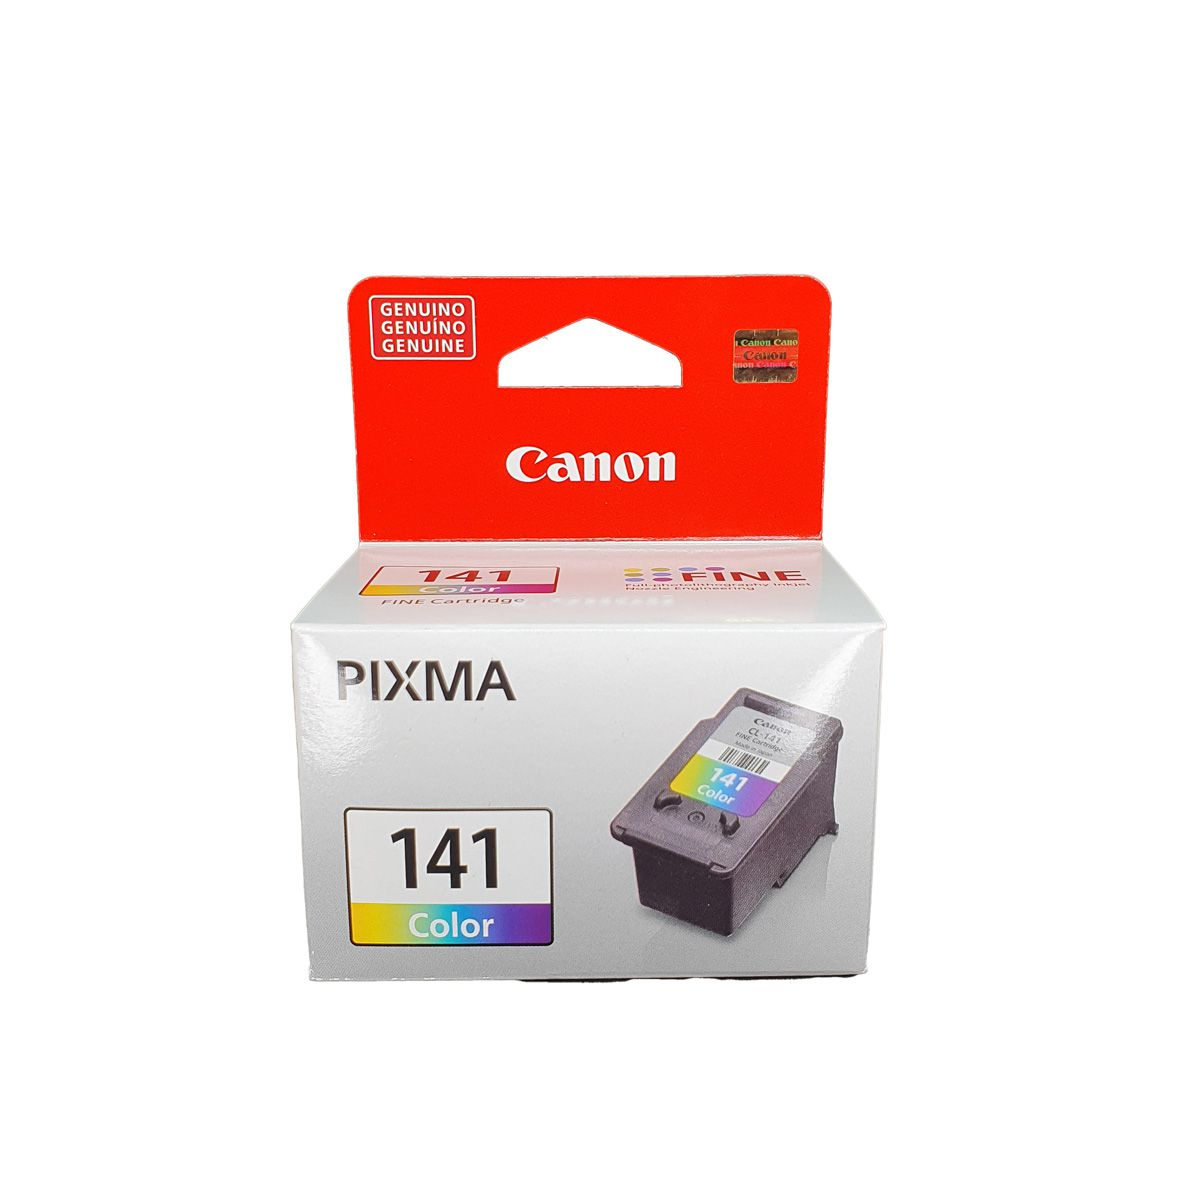 Cartucho Canon CL141 Colorido para MG2110 MG3110 MG4110